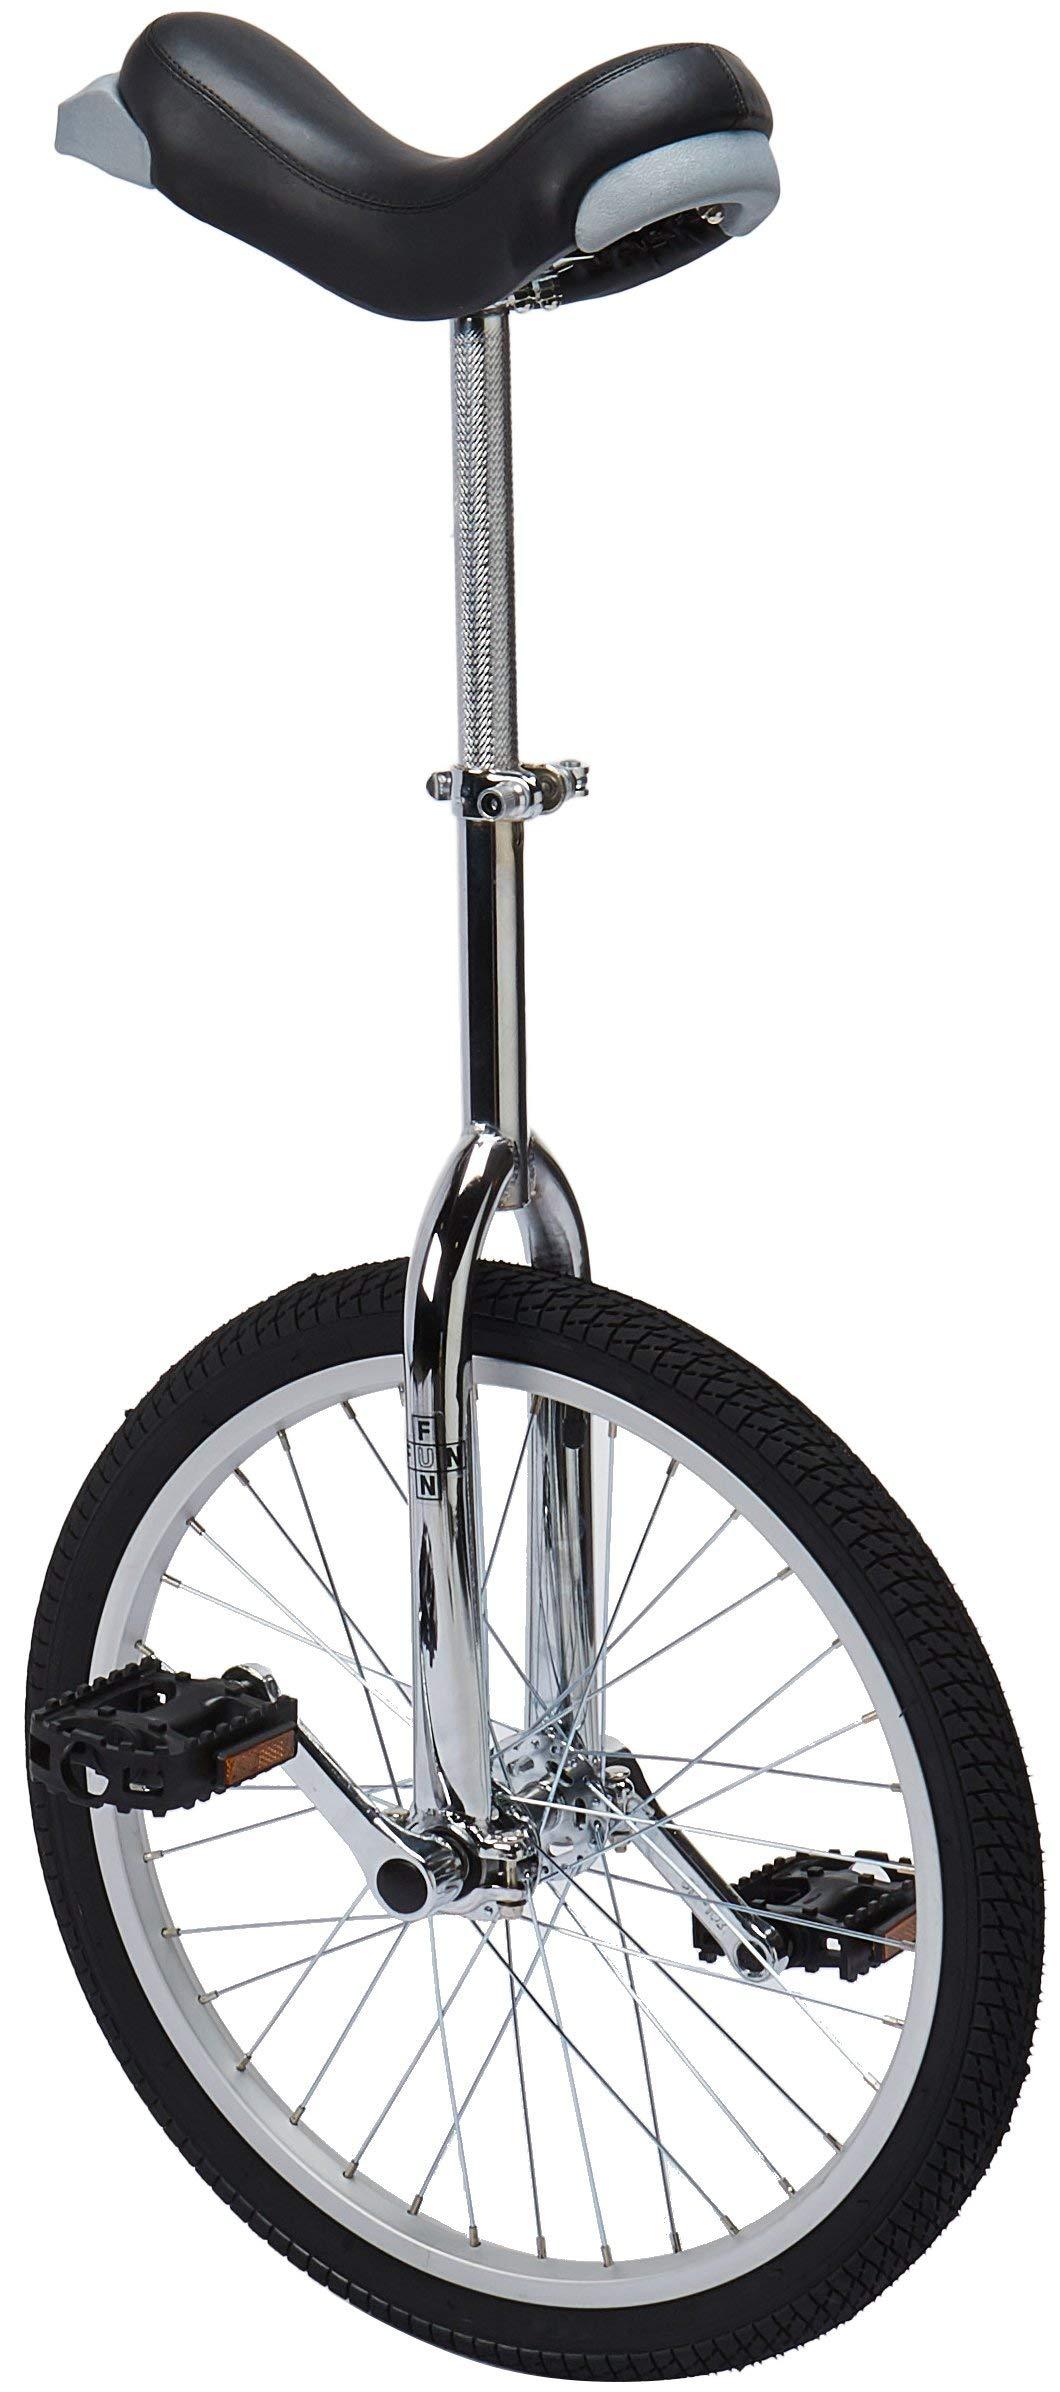 Fun 20 Inch Wheel Chrome Unicycle with Alloy Rim (Renewed)